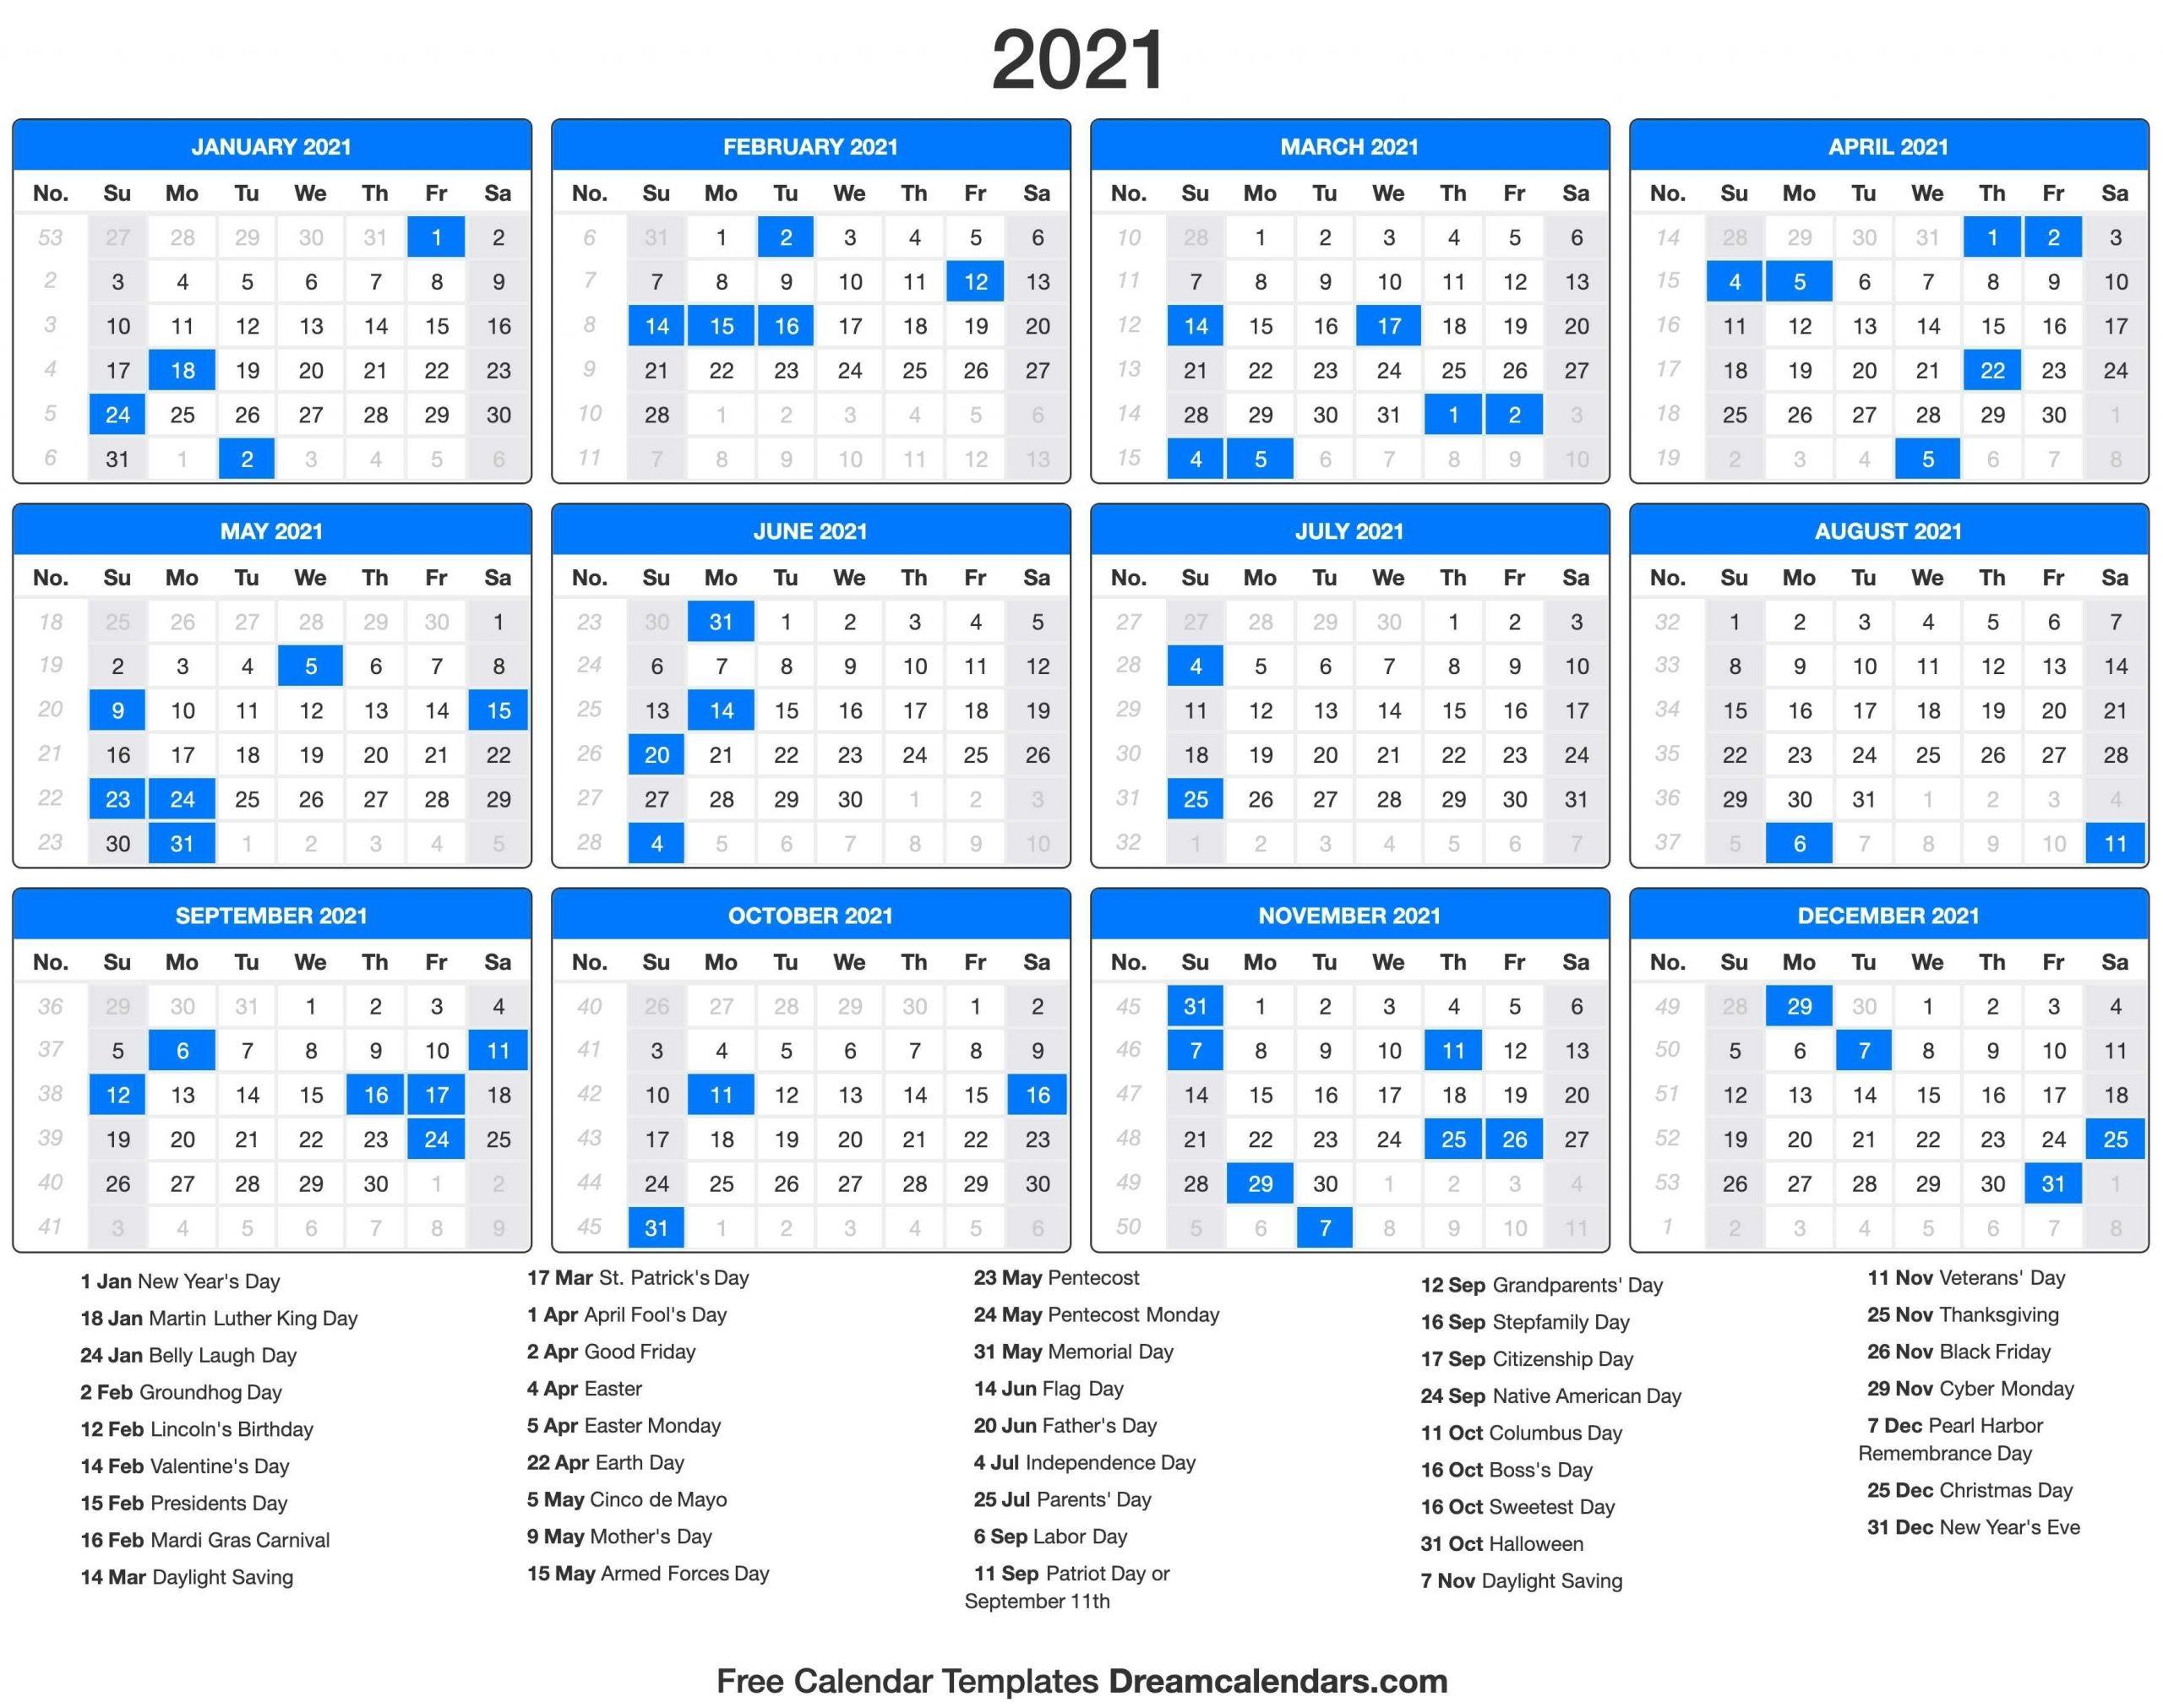 2021 Calendar With Holidays - Dream Calendars In 2020